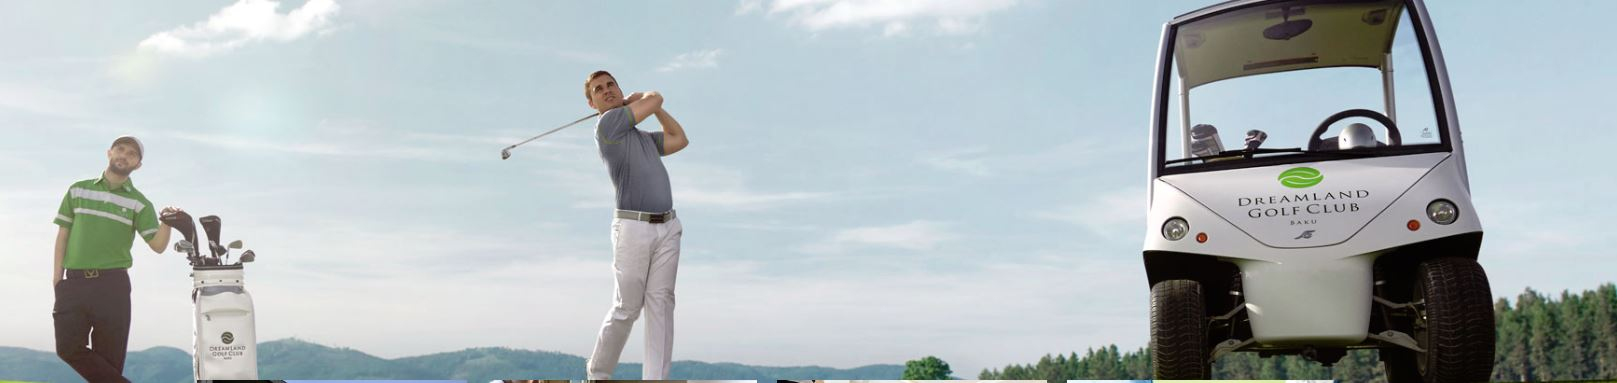 Dreamland Golf Club headerCapture